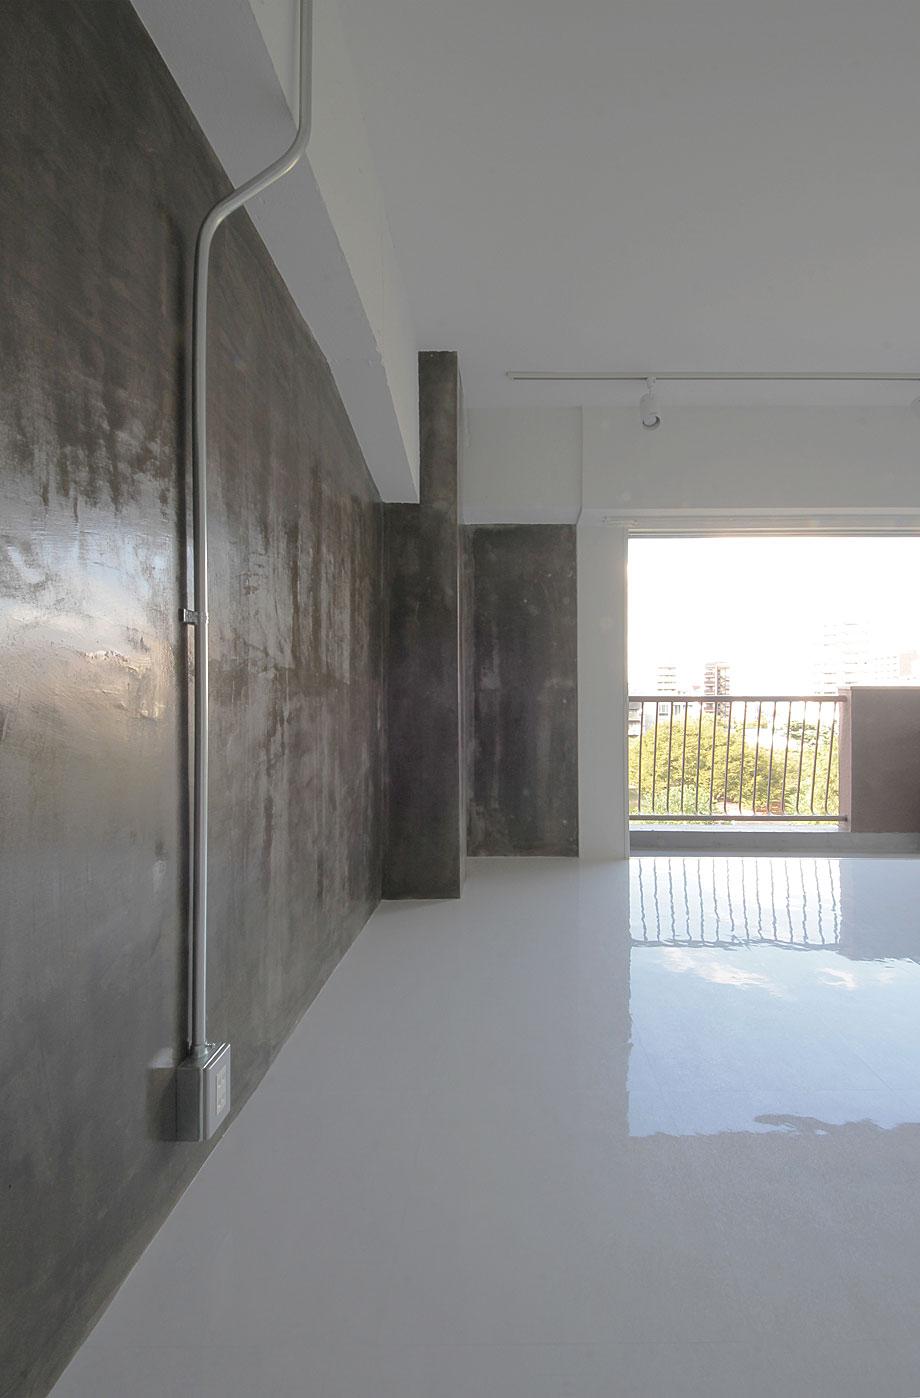 apartamento-osaka-japon-jun-murata-15